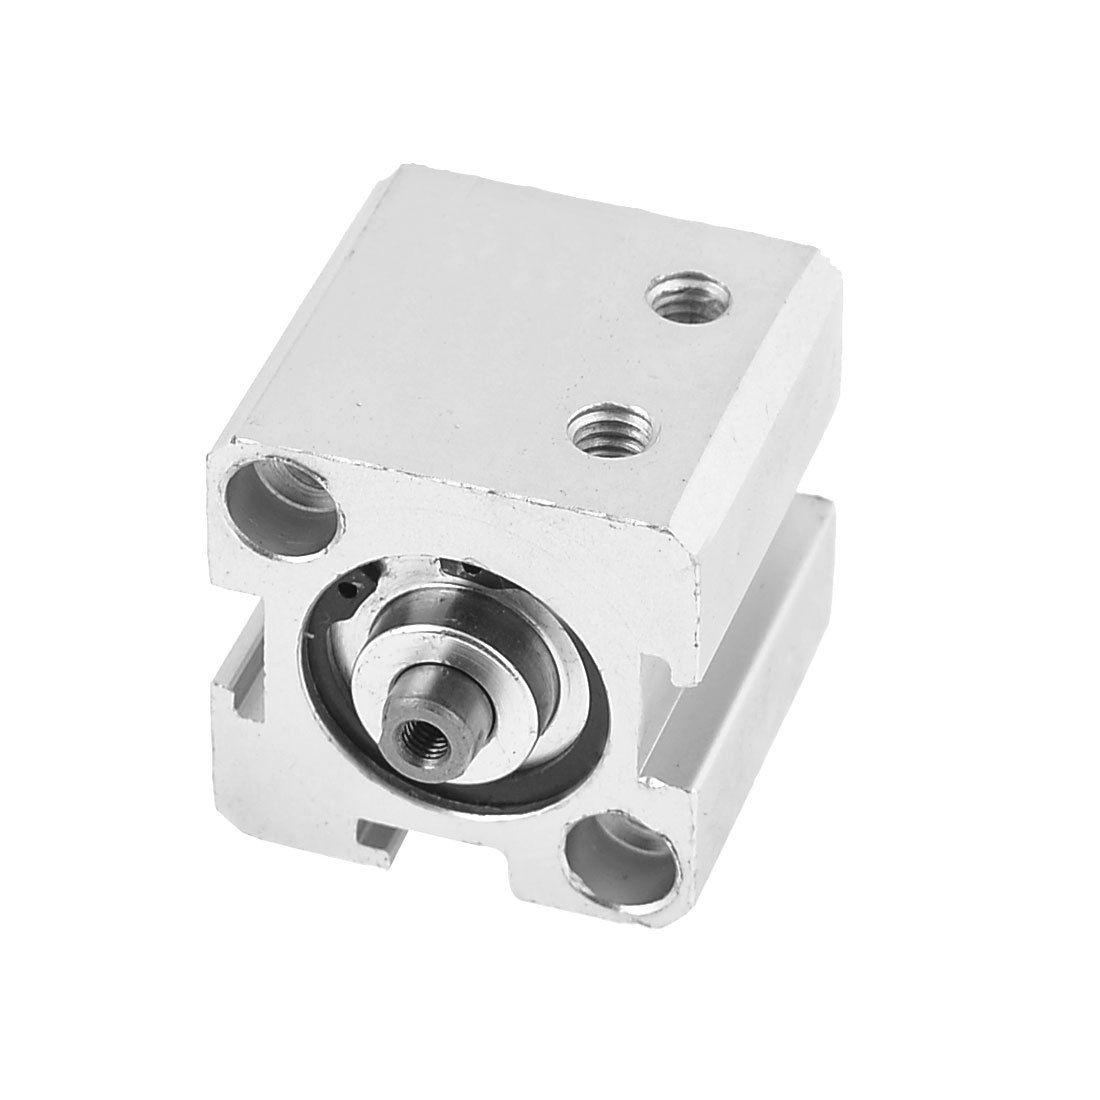 1 Pcs 16mm Bore 5mm Stroke Stainless steel Pneumatic Air Cylinder SDA16-51 Pcs 16mm Bore 5mm Stroke Stainless steel Pneumatic Air Cylinder SDA16-5